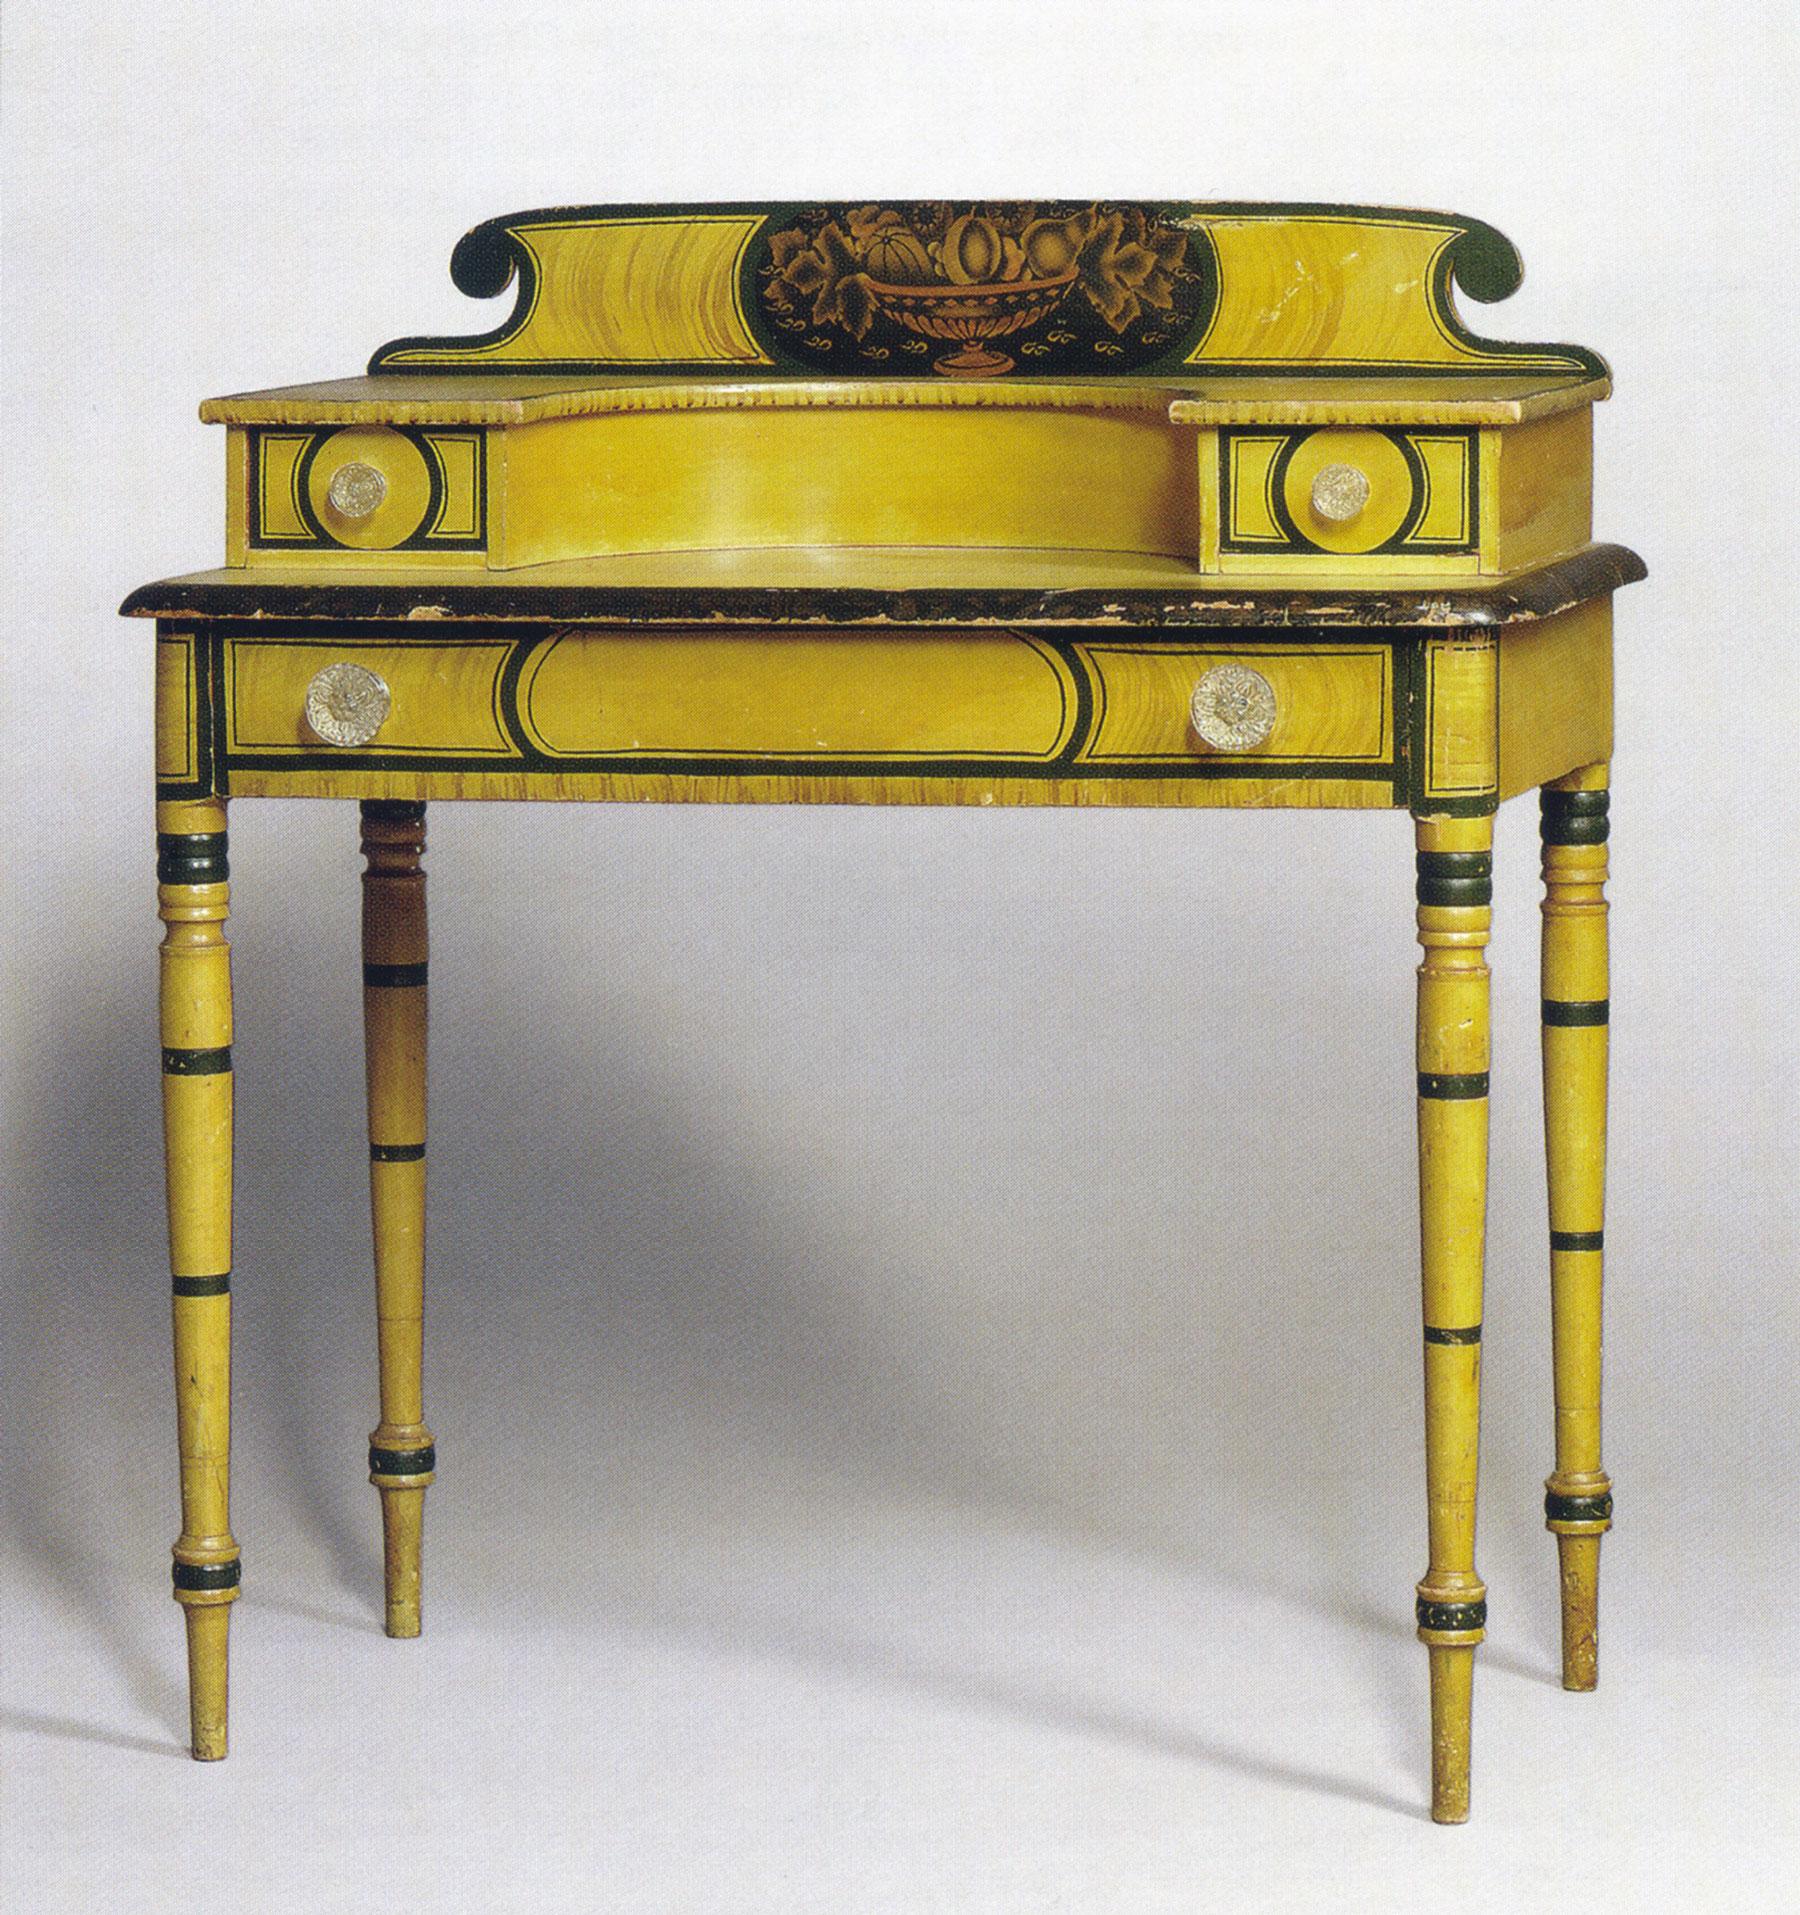 Dressing table, possibly David Colby or Willard Harris, Croydon, New Hampshire, c. 1835